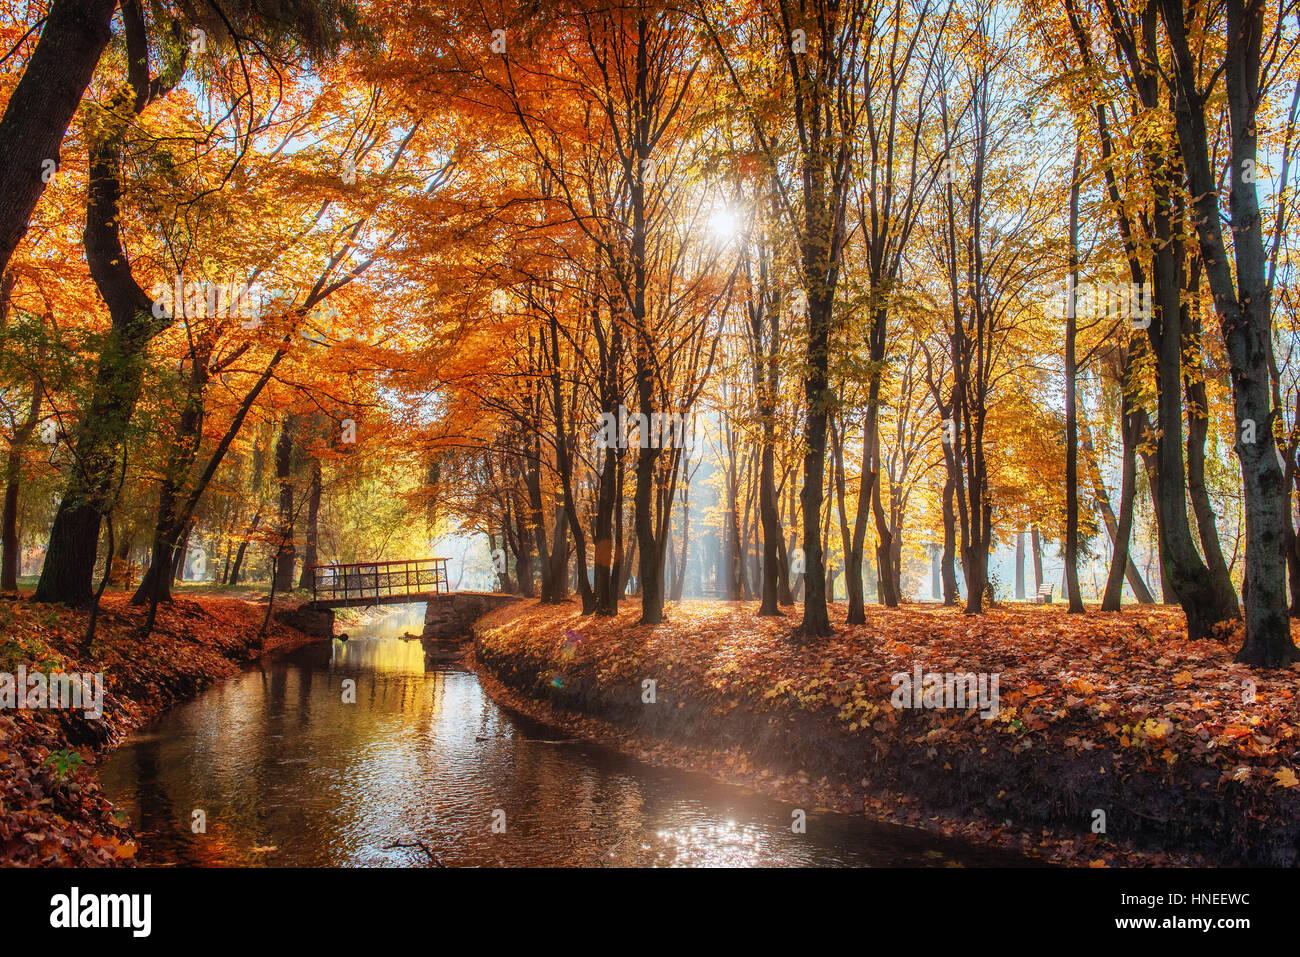 Zu Fuß Weg Brücke über den River mit bunten Bäumen Stockbild